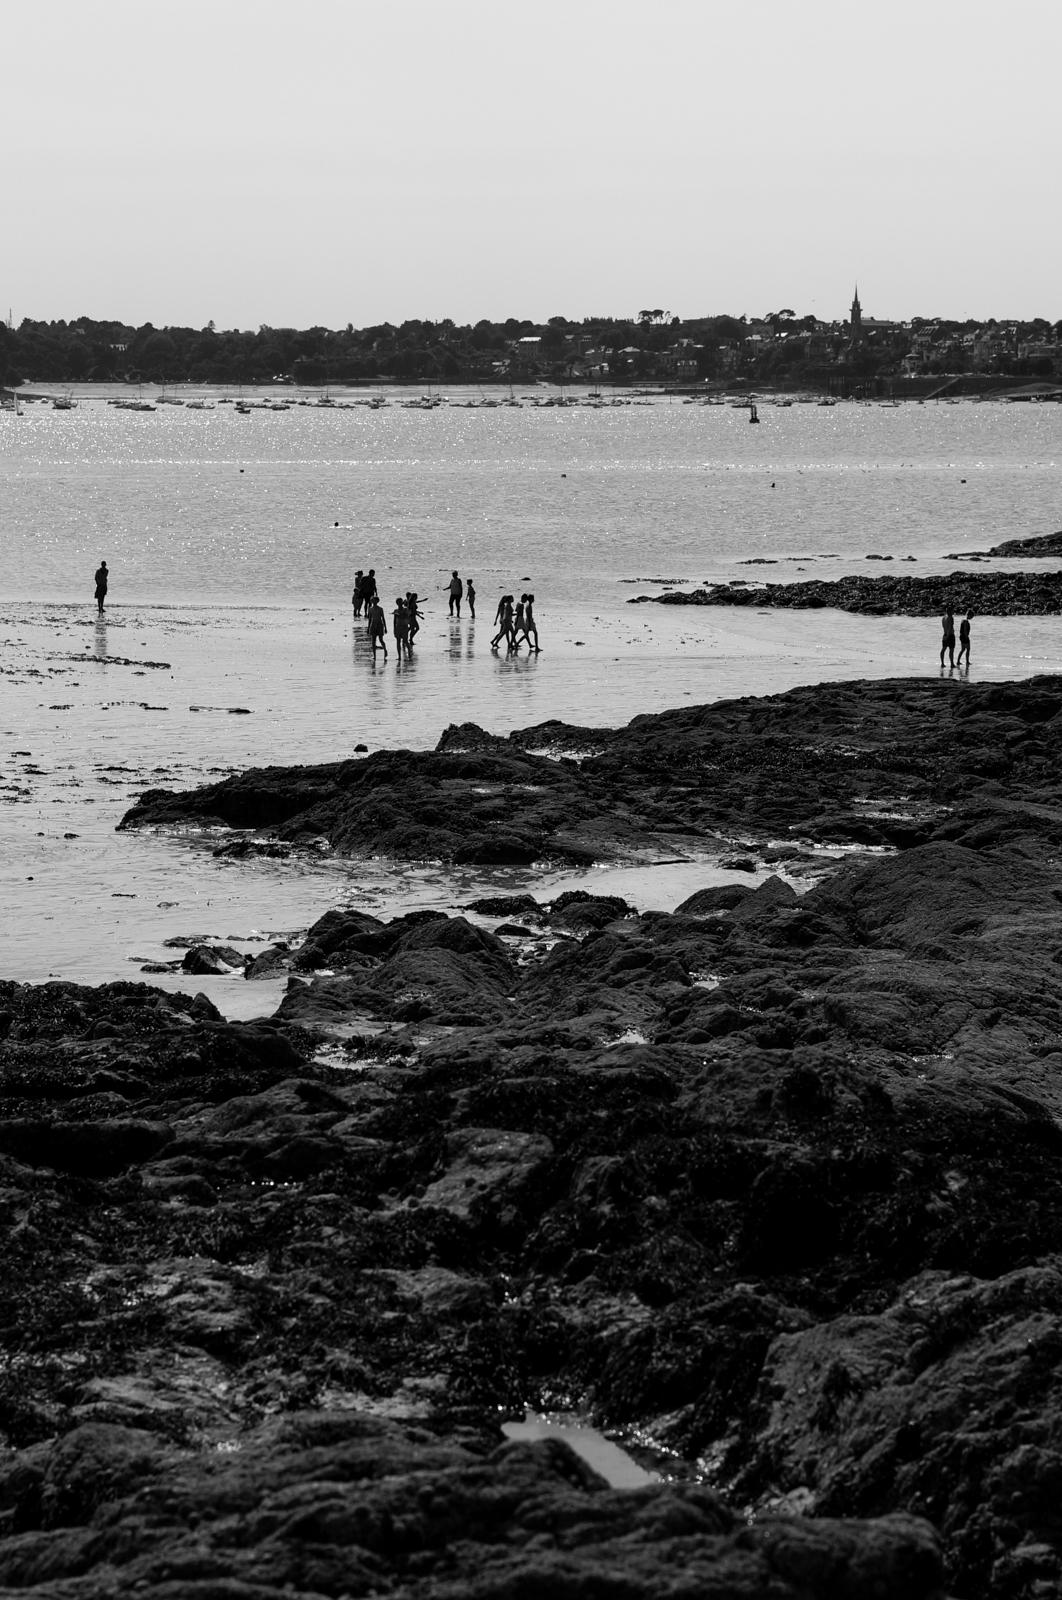 saint-malo, tourisme bretagne, visiter bretagne, visiter saint-malo, idée balade saint-malo, plage bretagne, plage bon secours